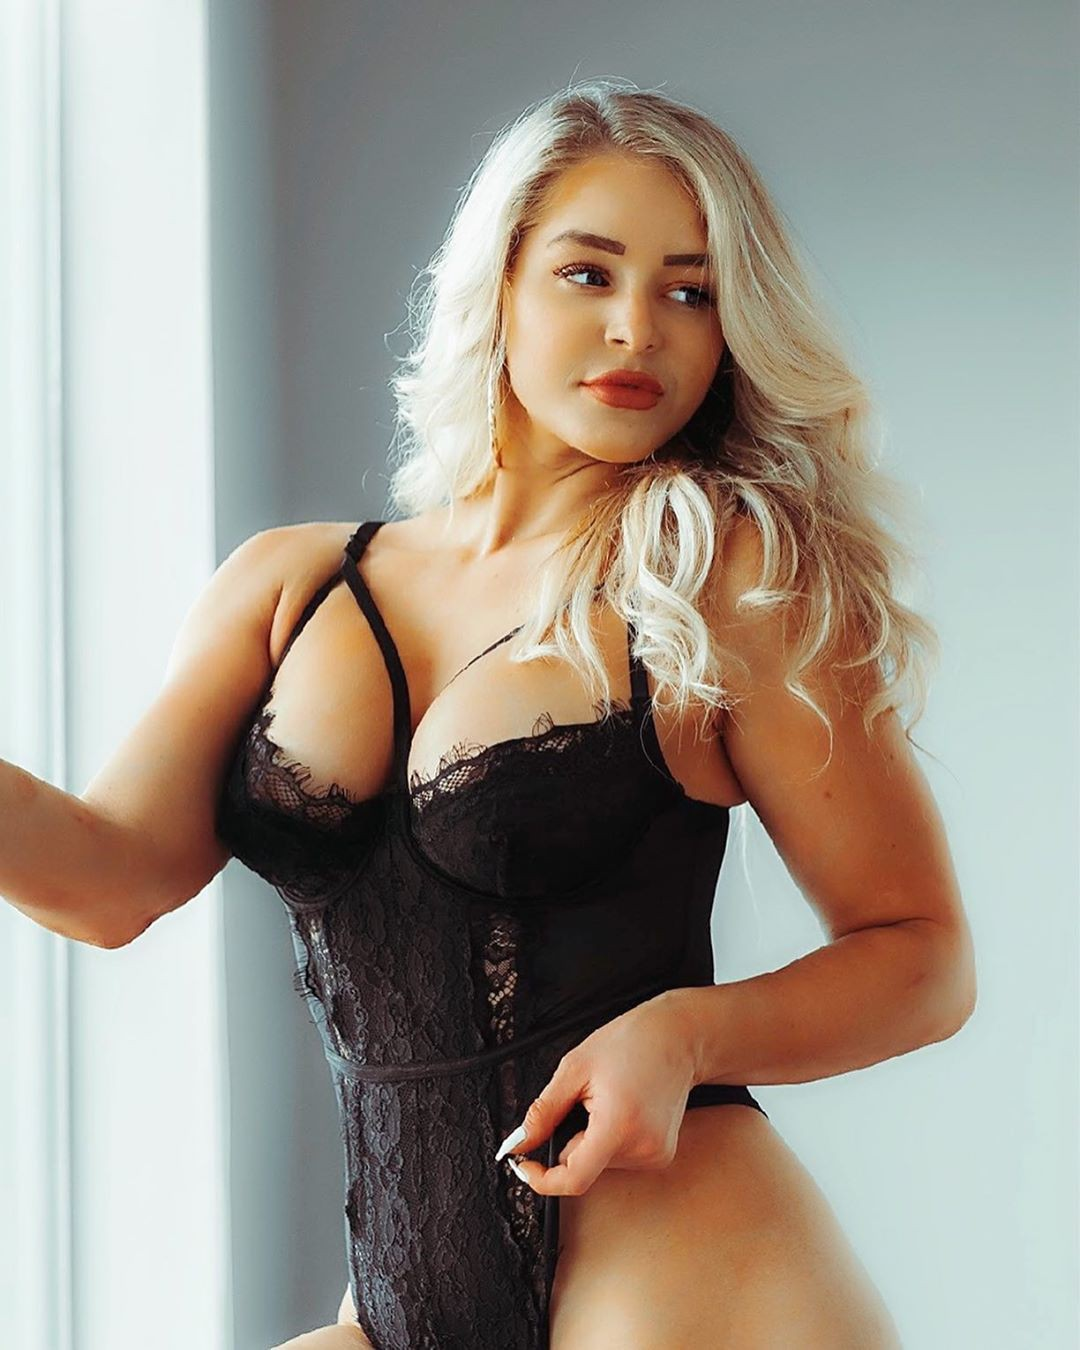 Courtney Tailor Hot Instagram Photos, Pin-up girl, Photo shoot